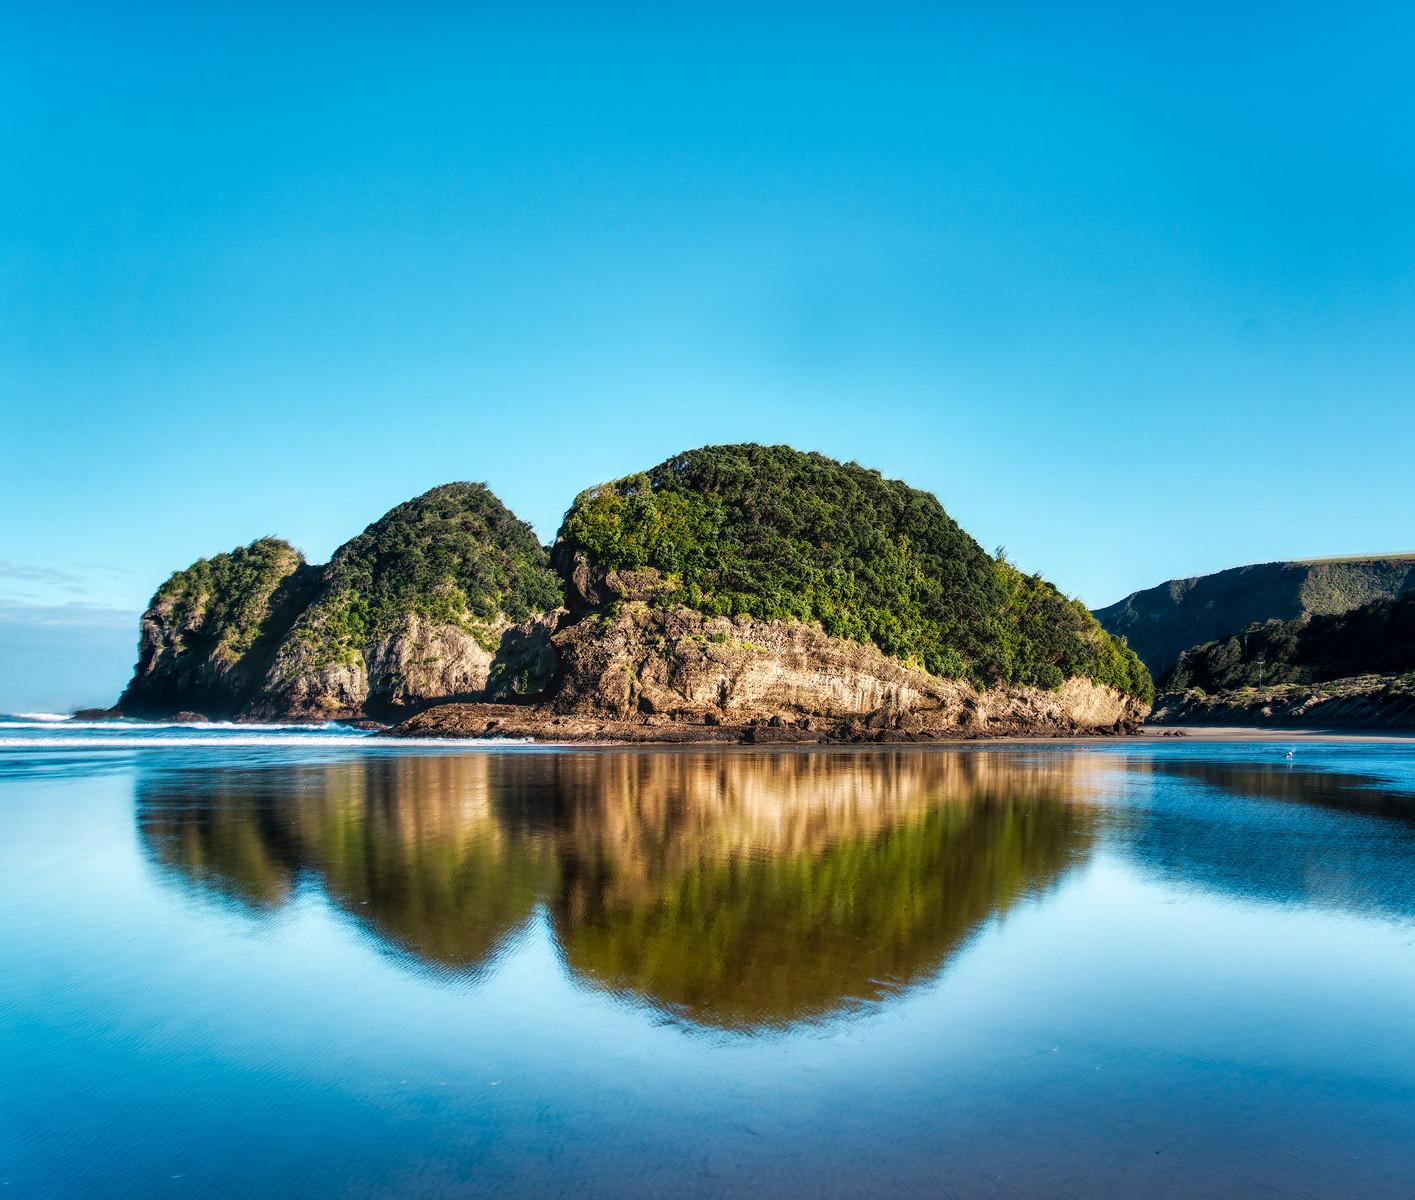 North Island Reflection